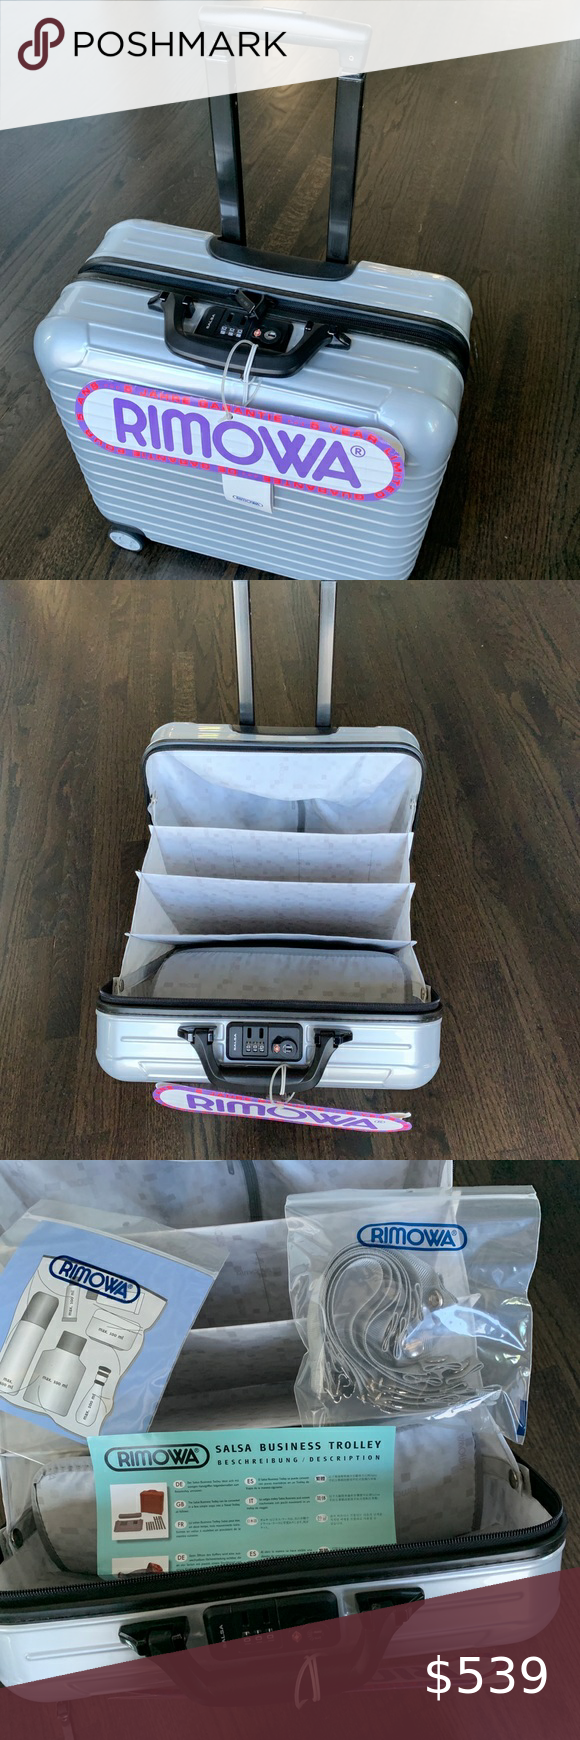 Travel Suitcase 4 Biz   Rimowa, Rimowa salsa, Travel